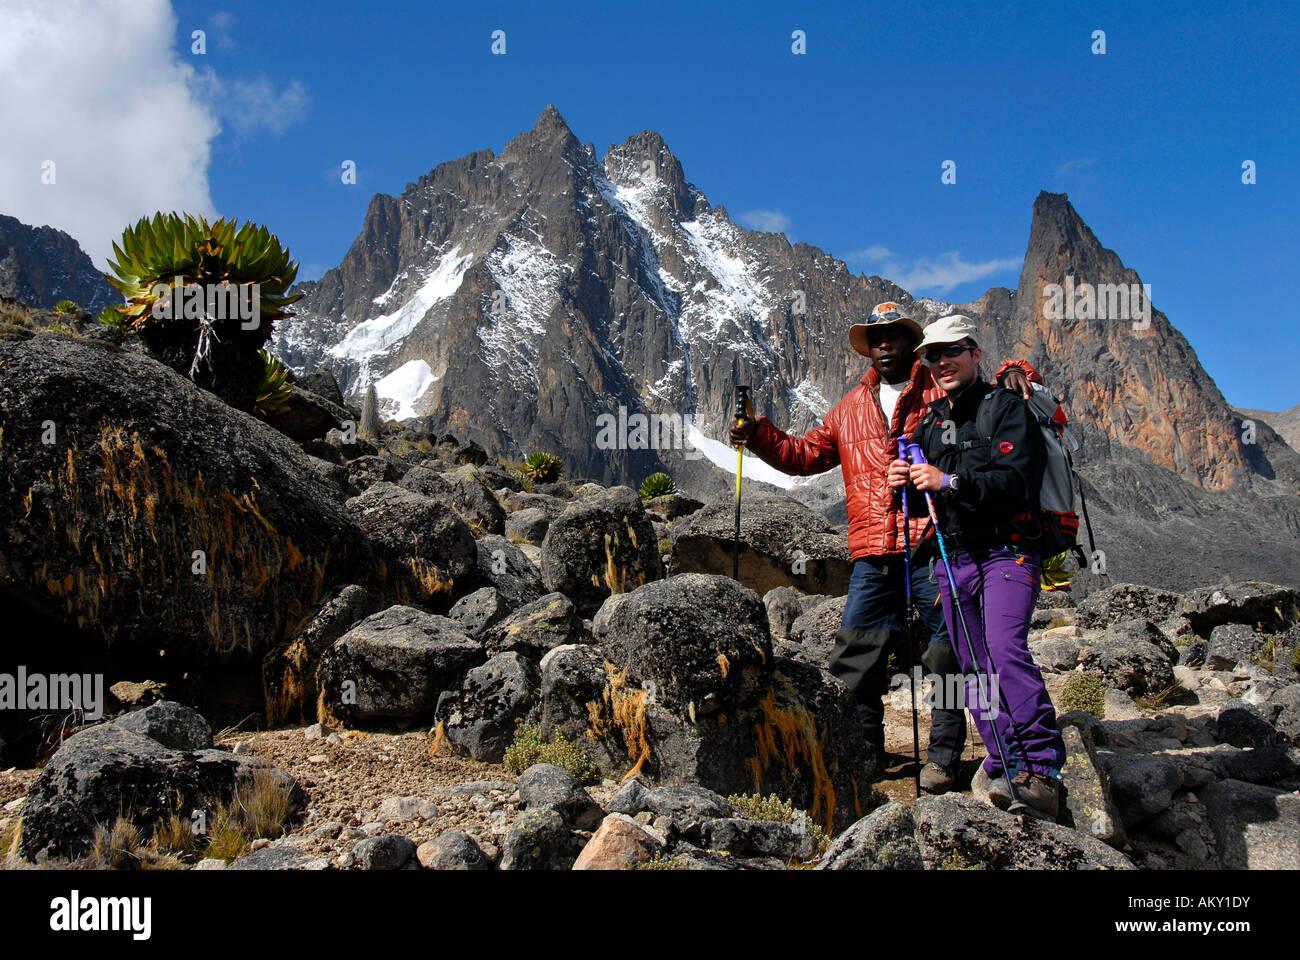 Mountaineerers among rocks below snow covered summit Batian (5199 m) Mount Kenya National Park Kenya - Stock Image